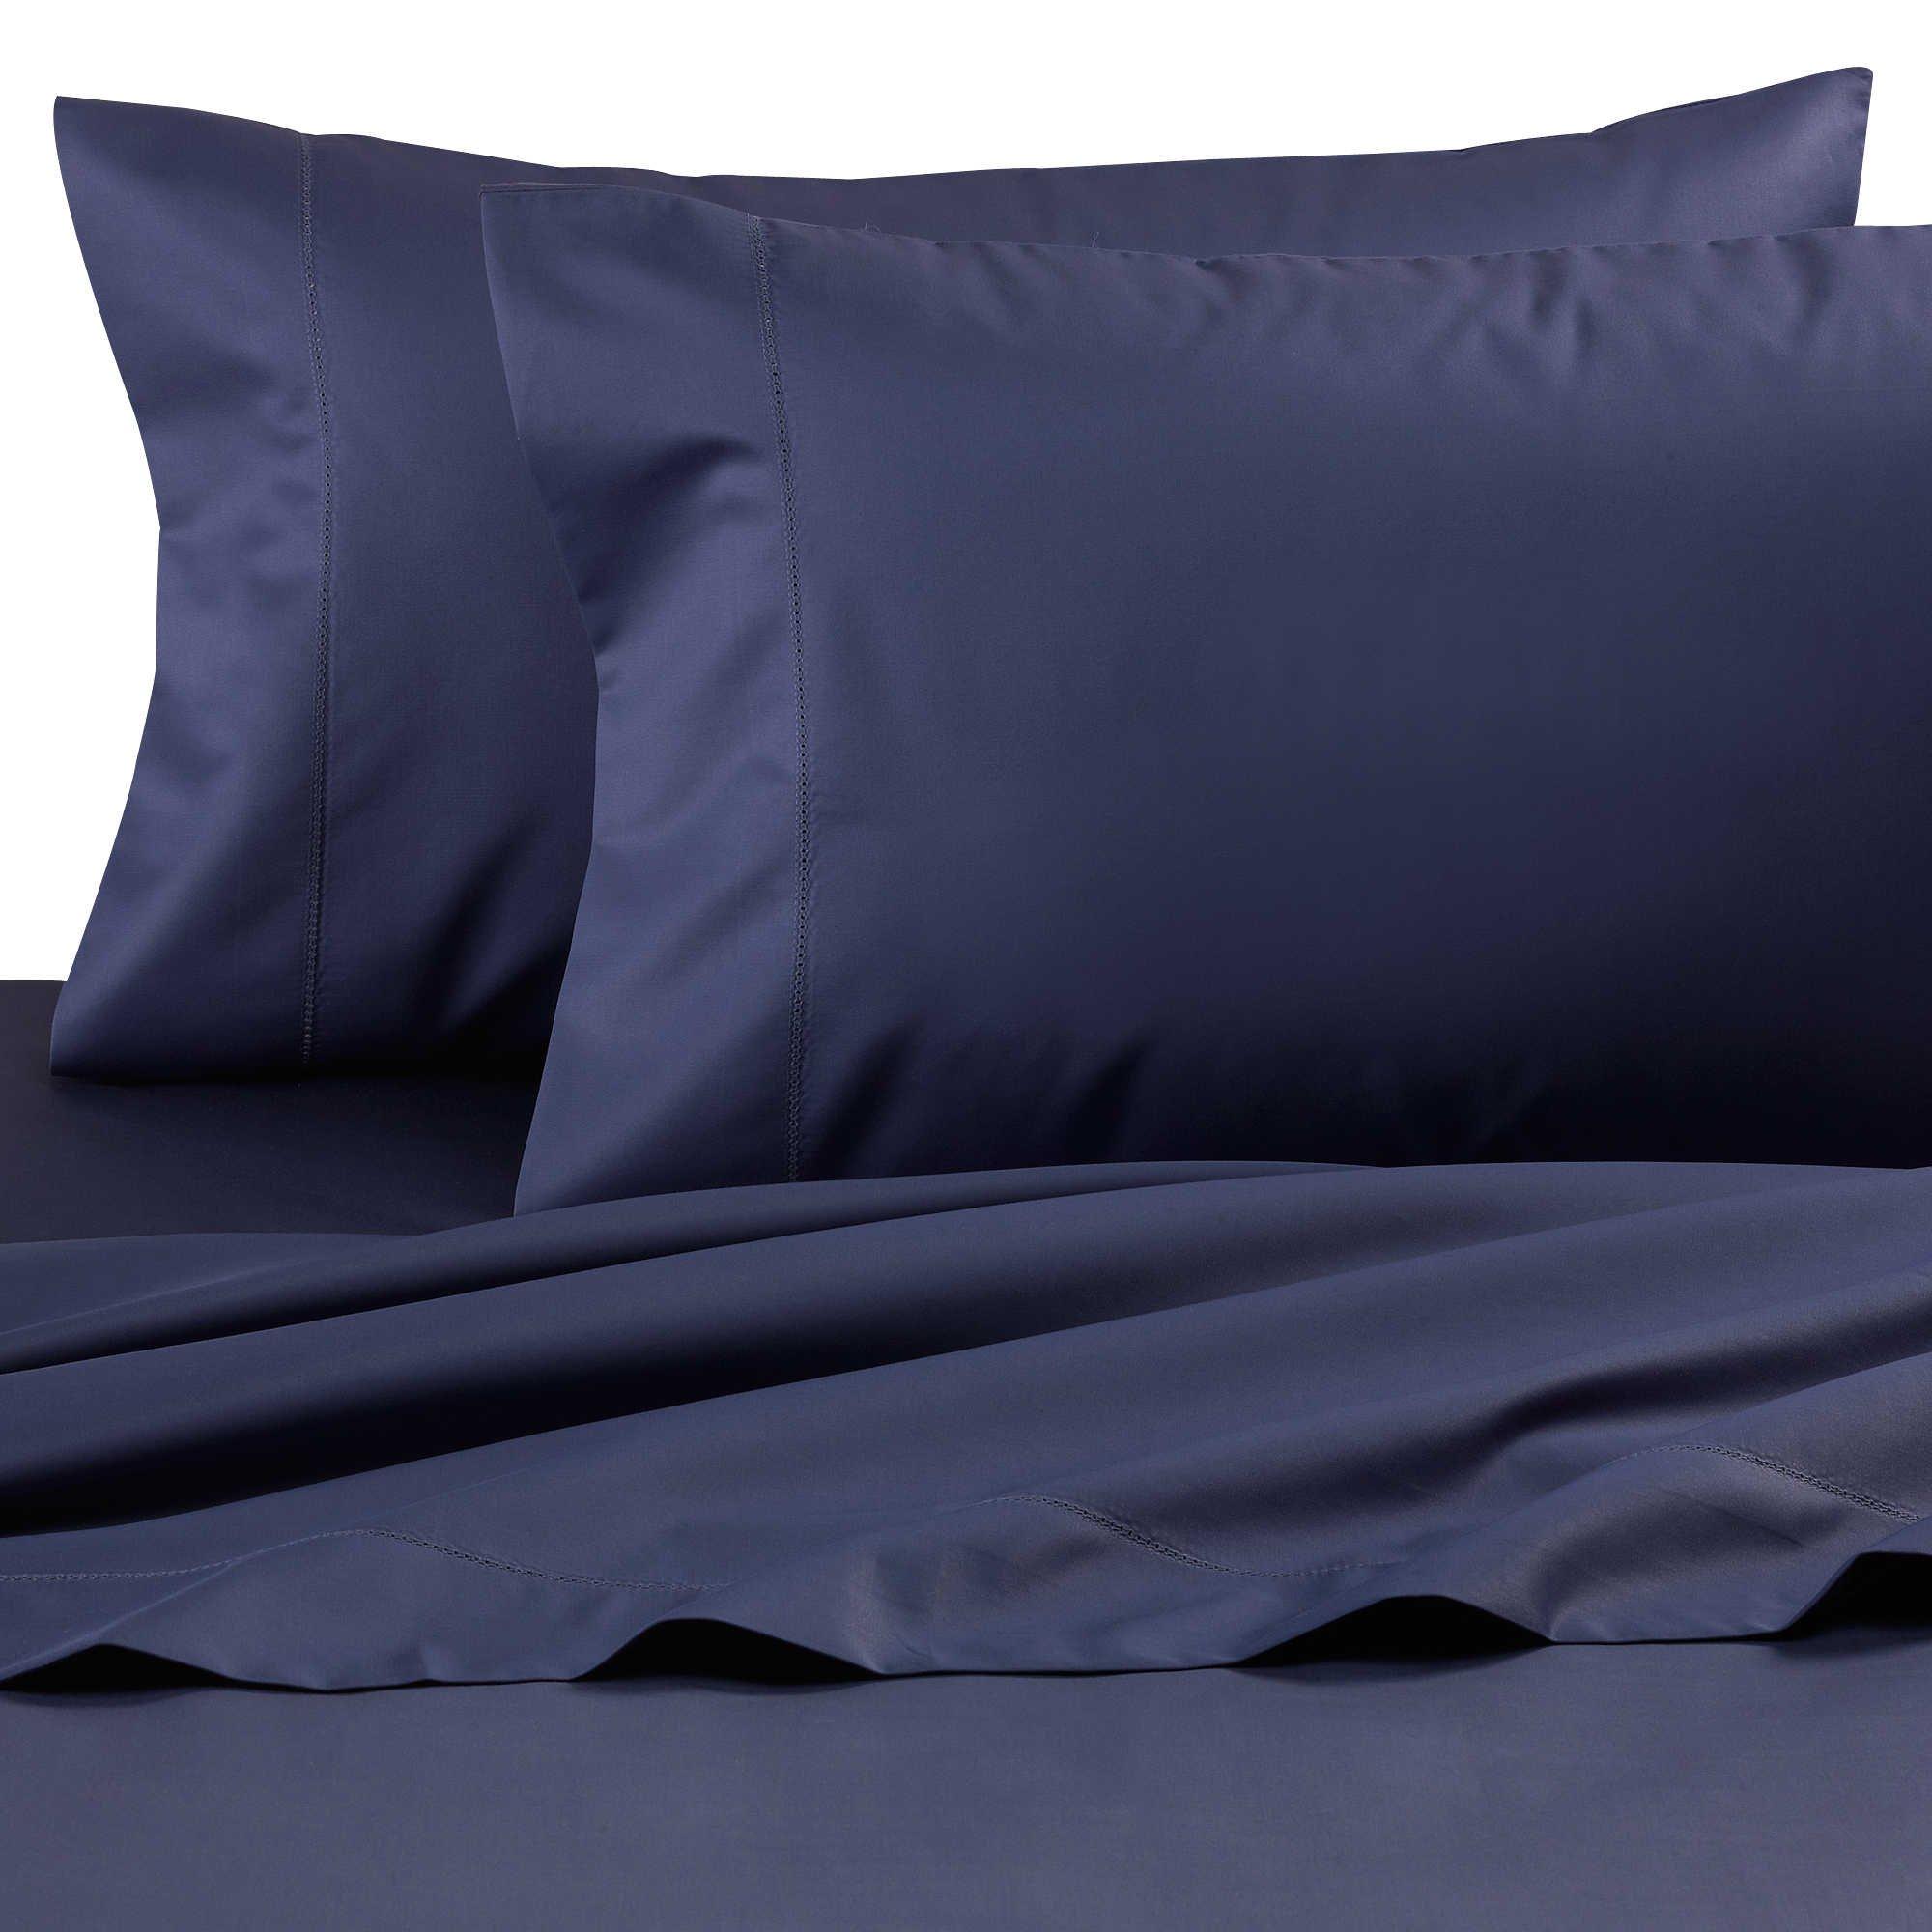 Wamsutta Dream Zone Nightshadow Blue King Sheet Set, 750 Thread Count